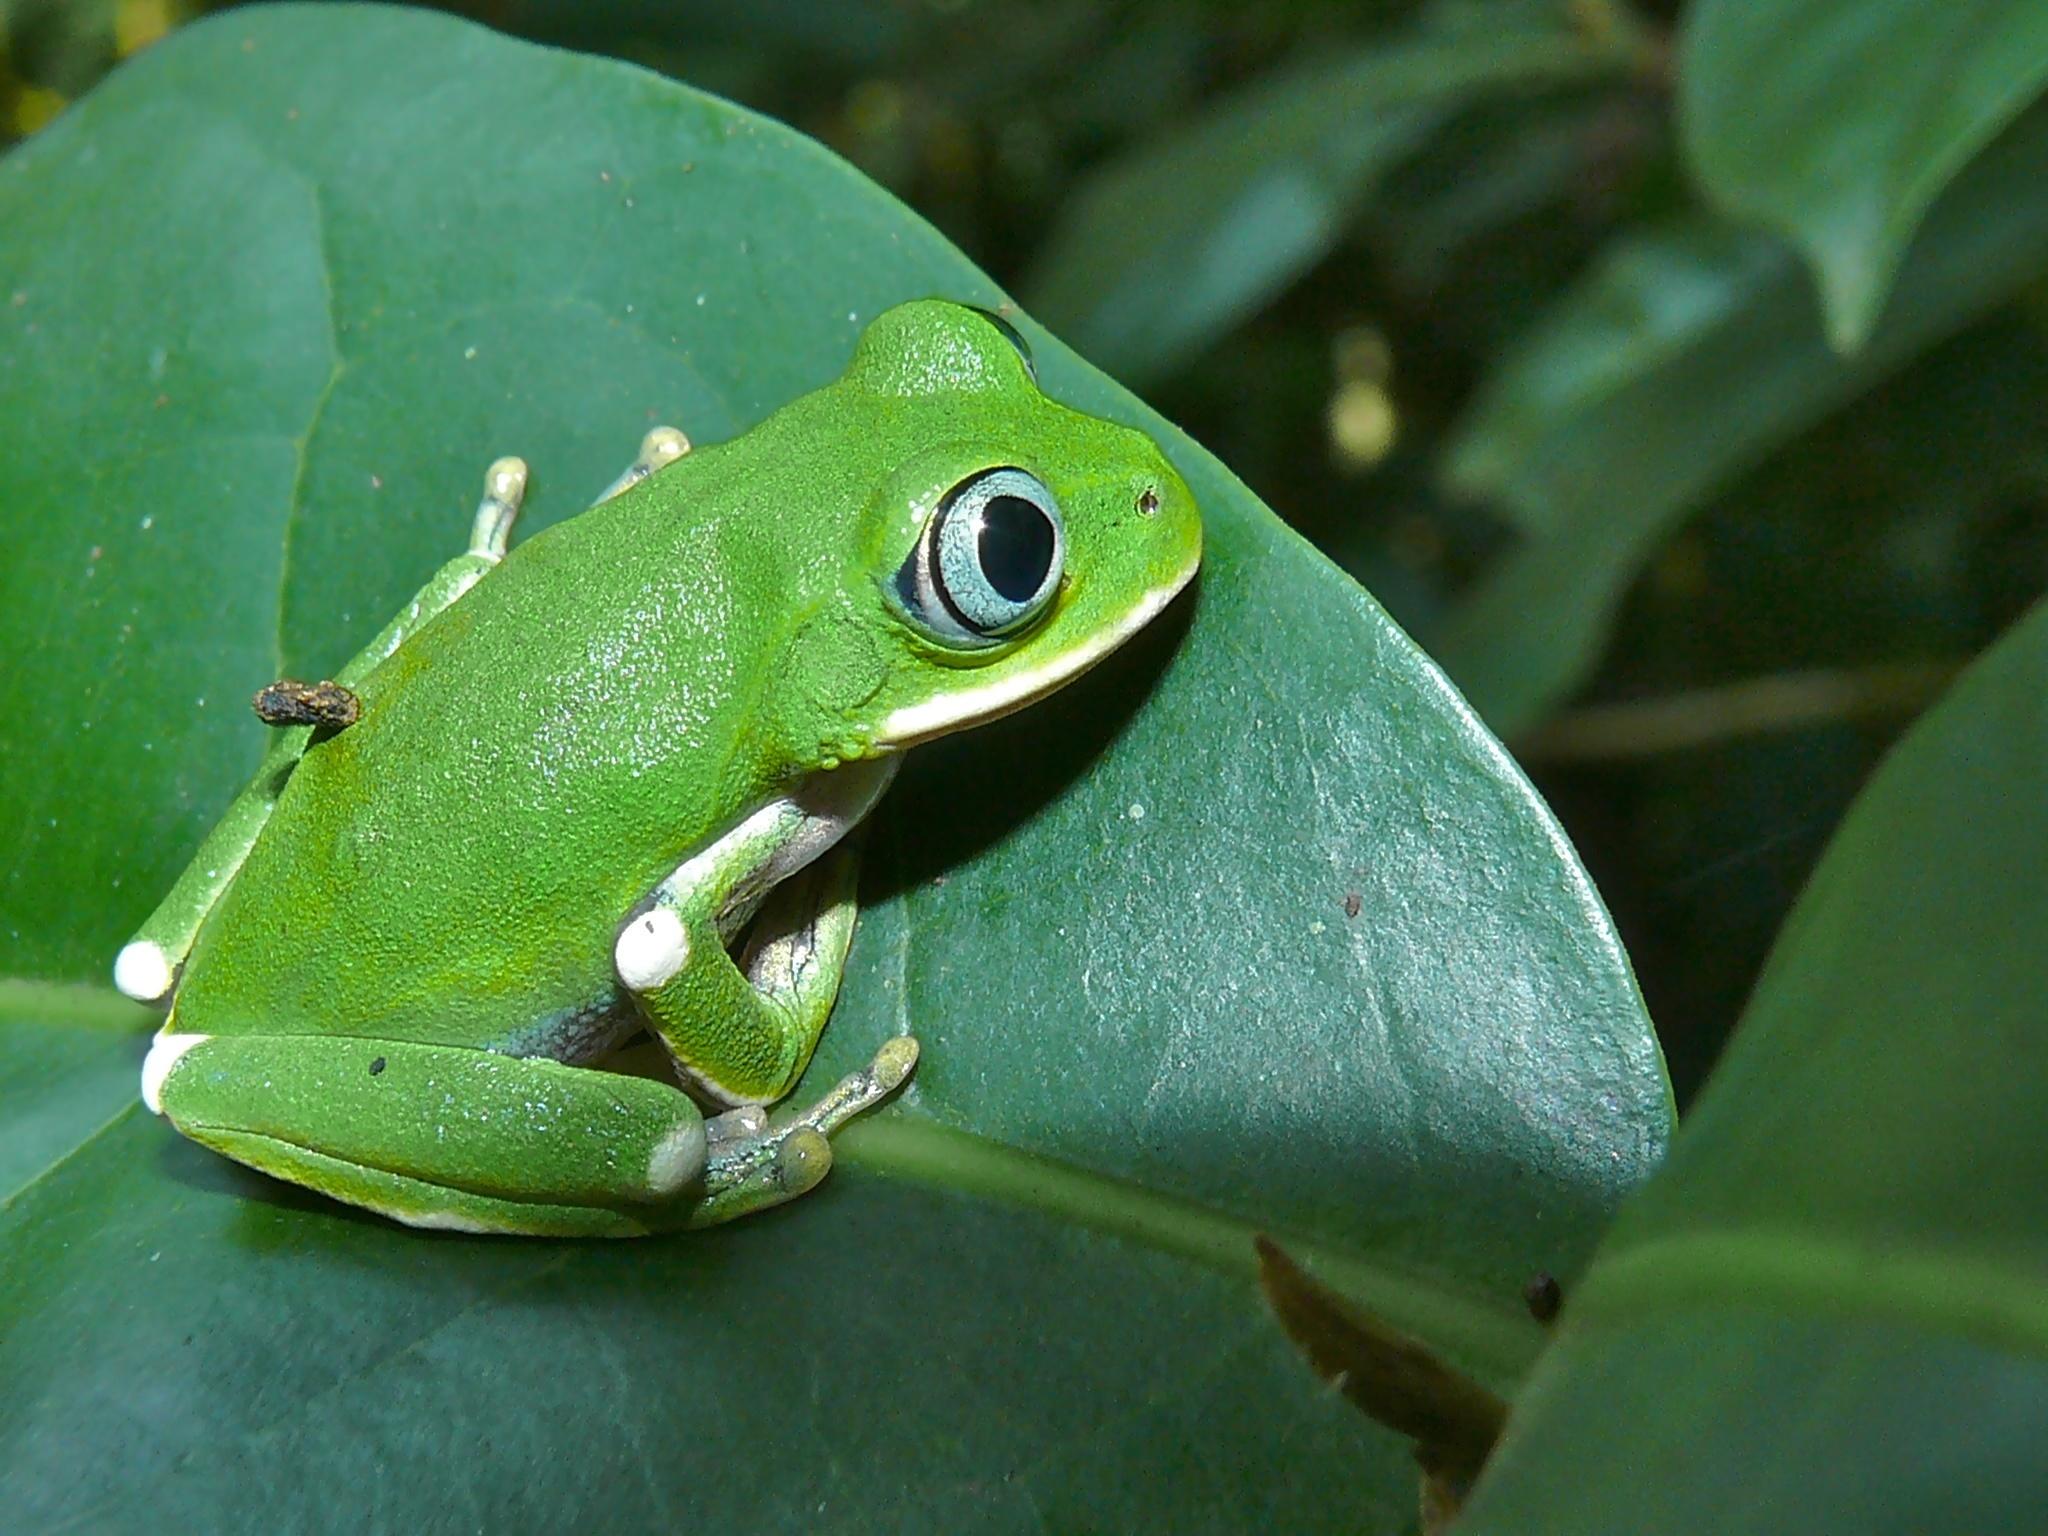 Image of Kivu tree frog